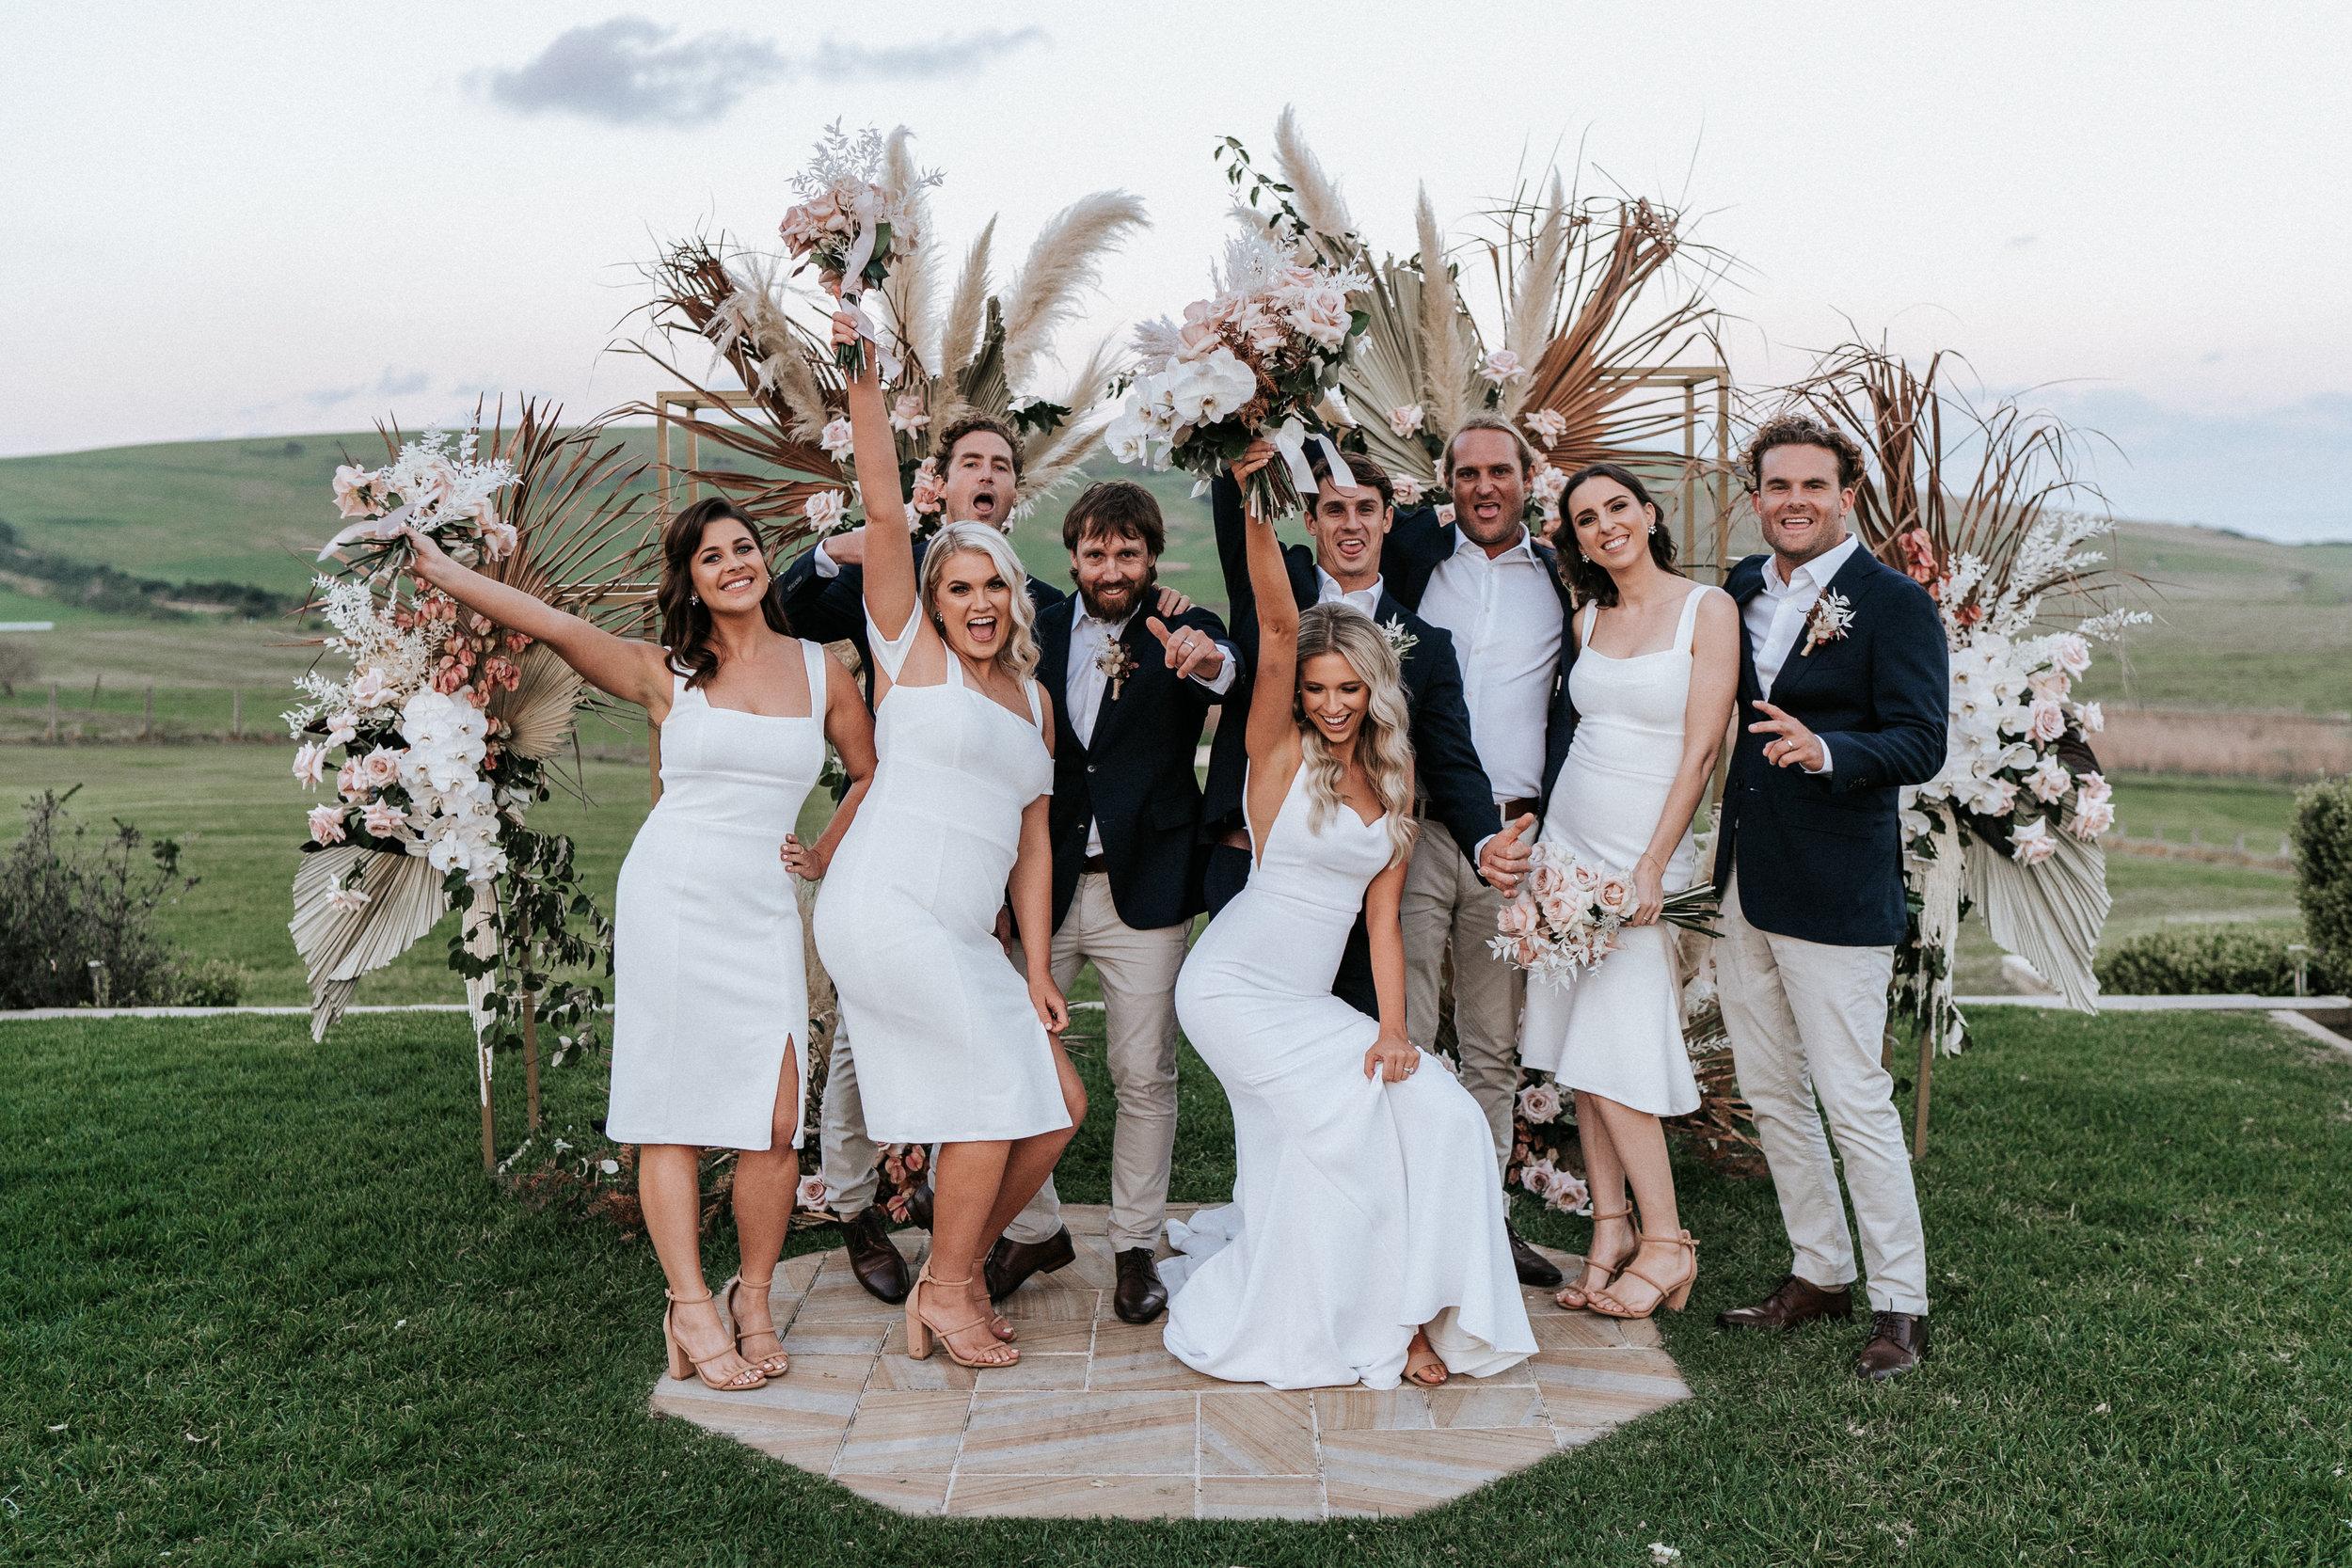 gemaya-tim-bilmon-wedding-817.jpg